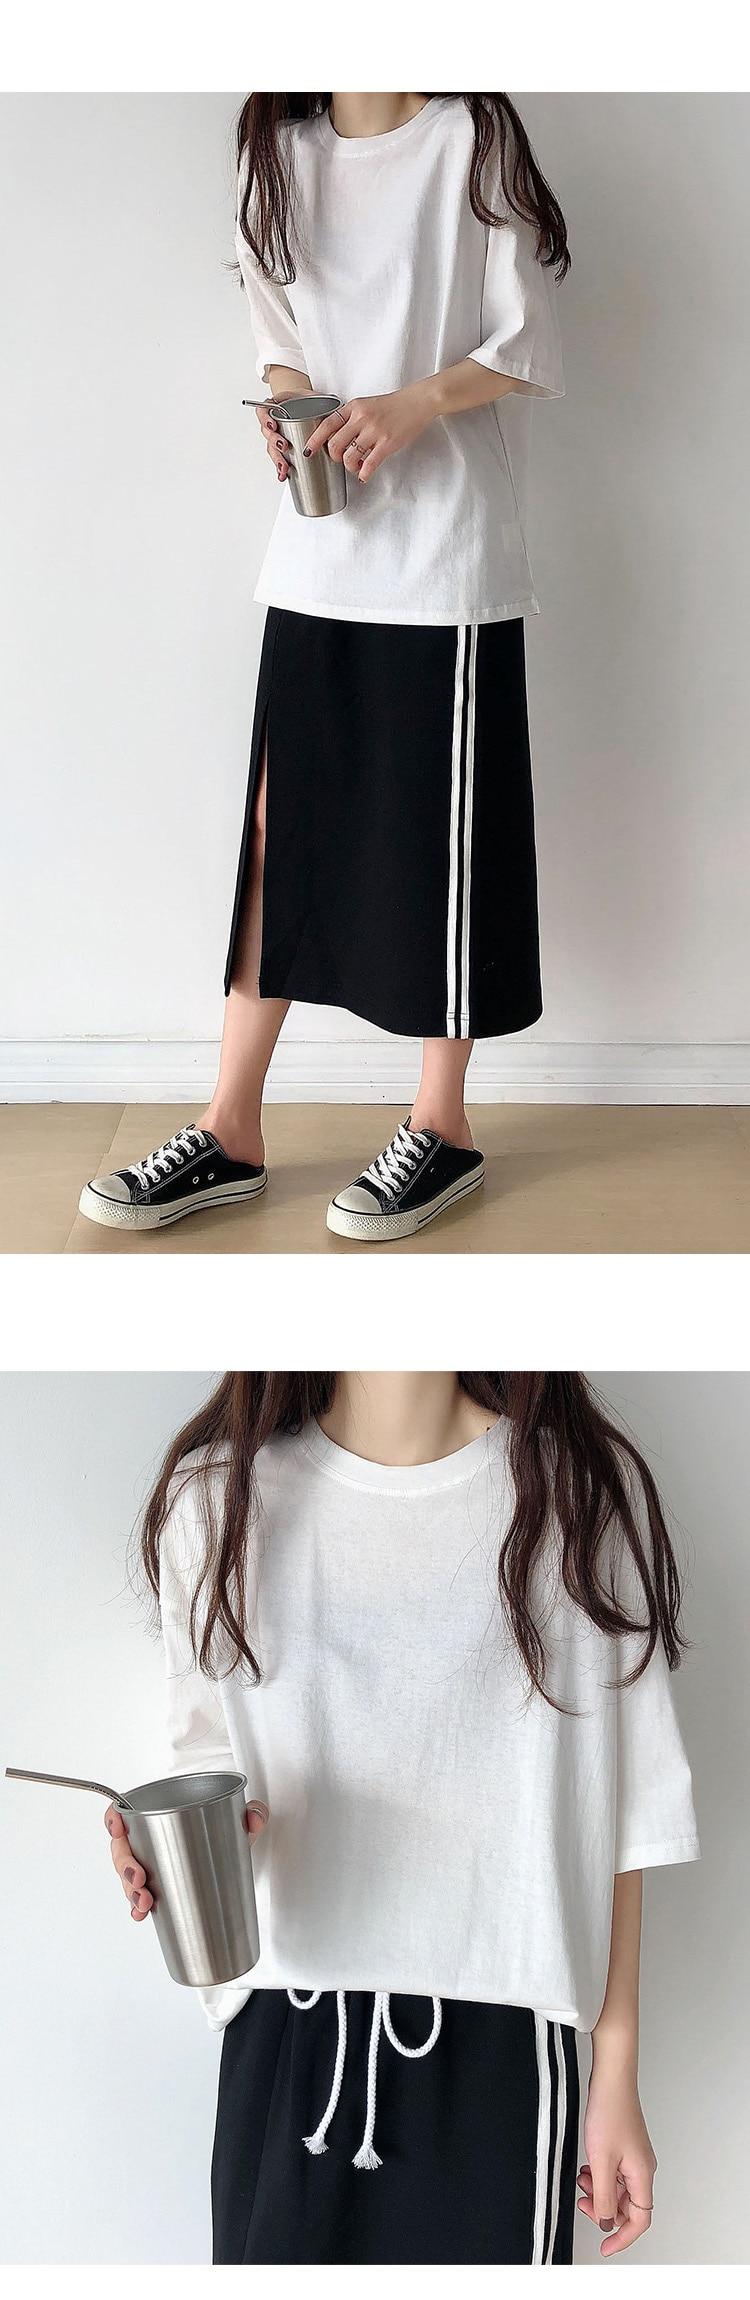 H7fed75b8c24a4e70b5a906113b278373s - Summer O-Neck Short Sleeves Minimalist Loose Basic T-Shirt